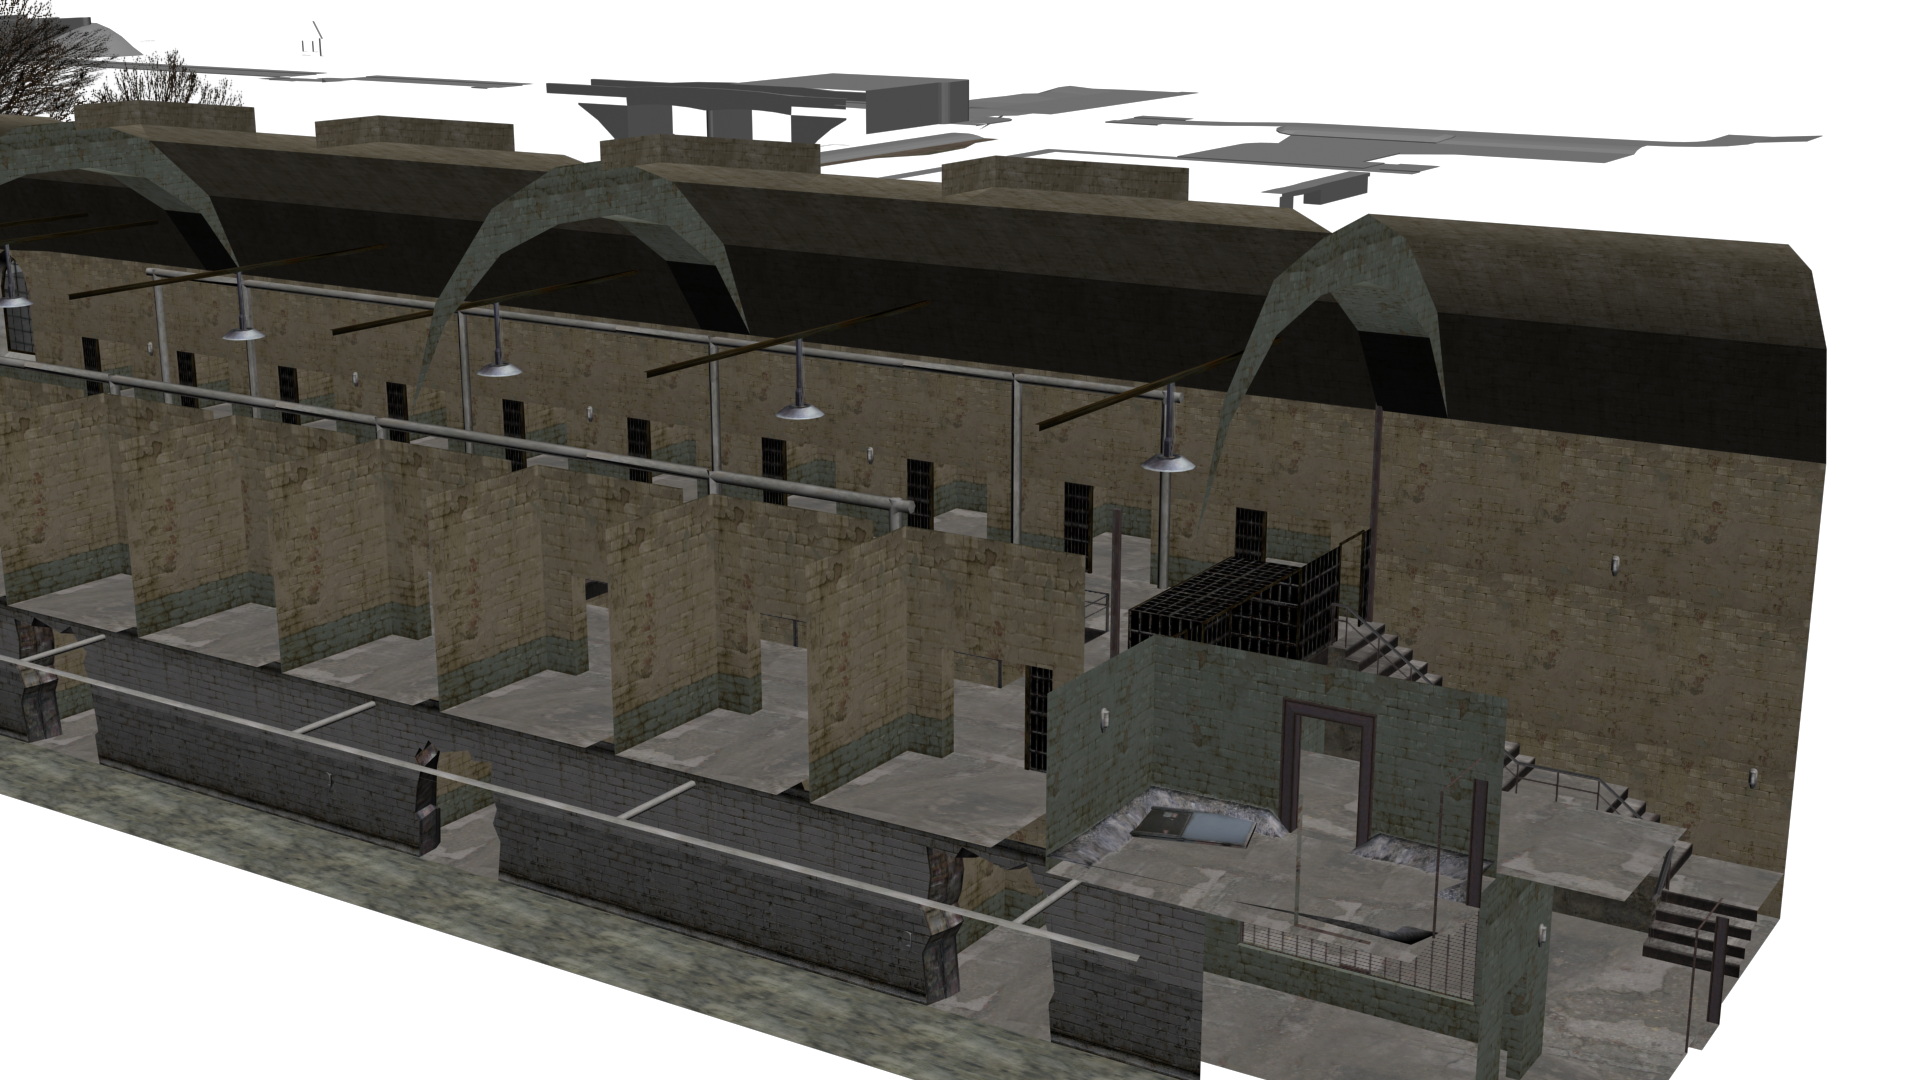 carcer_prison_sorting_3.png